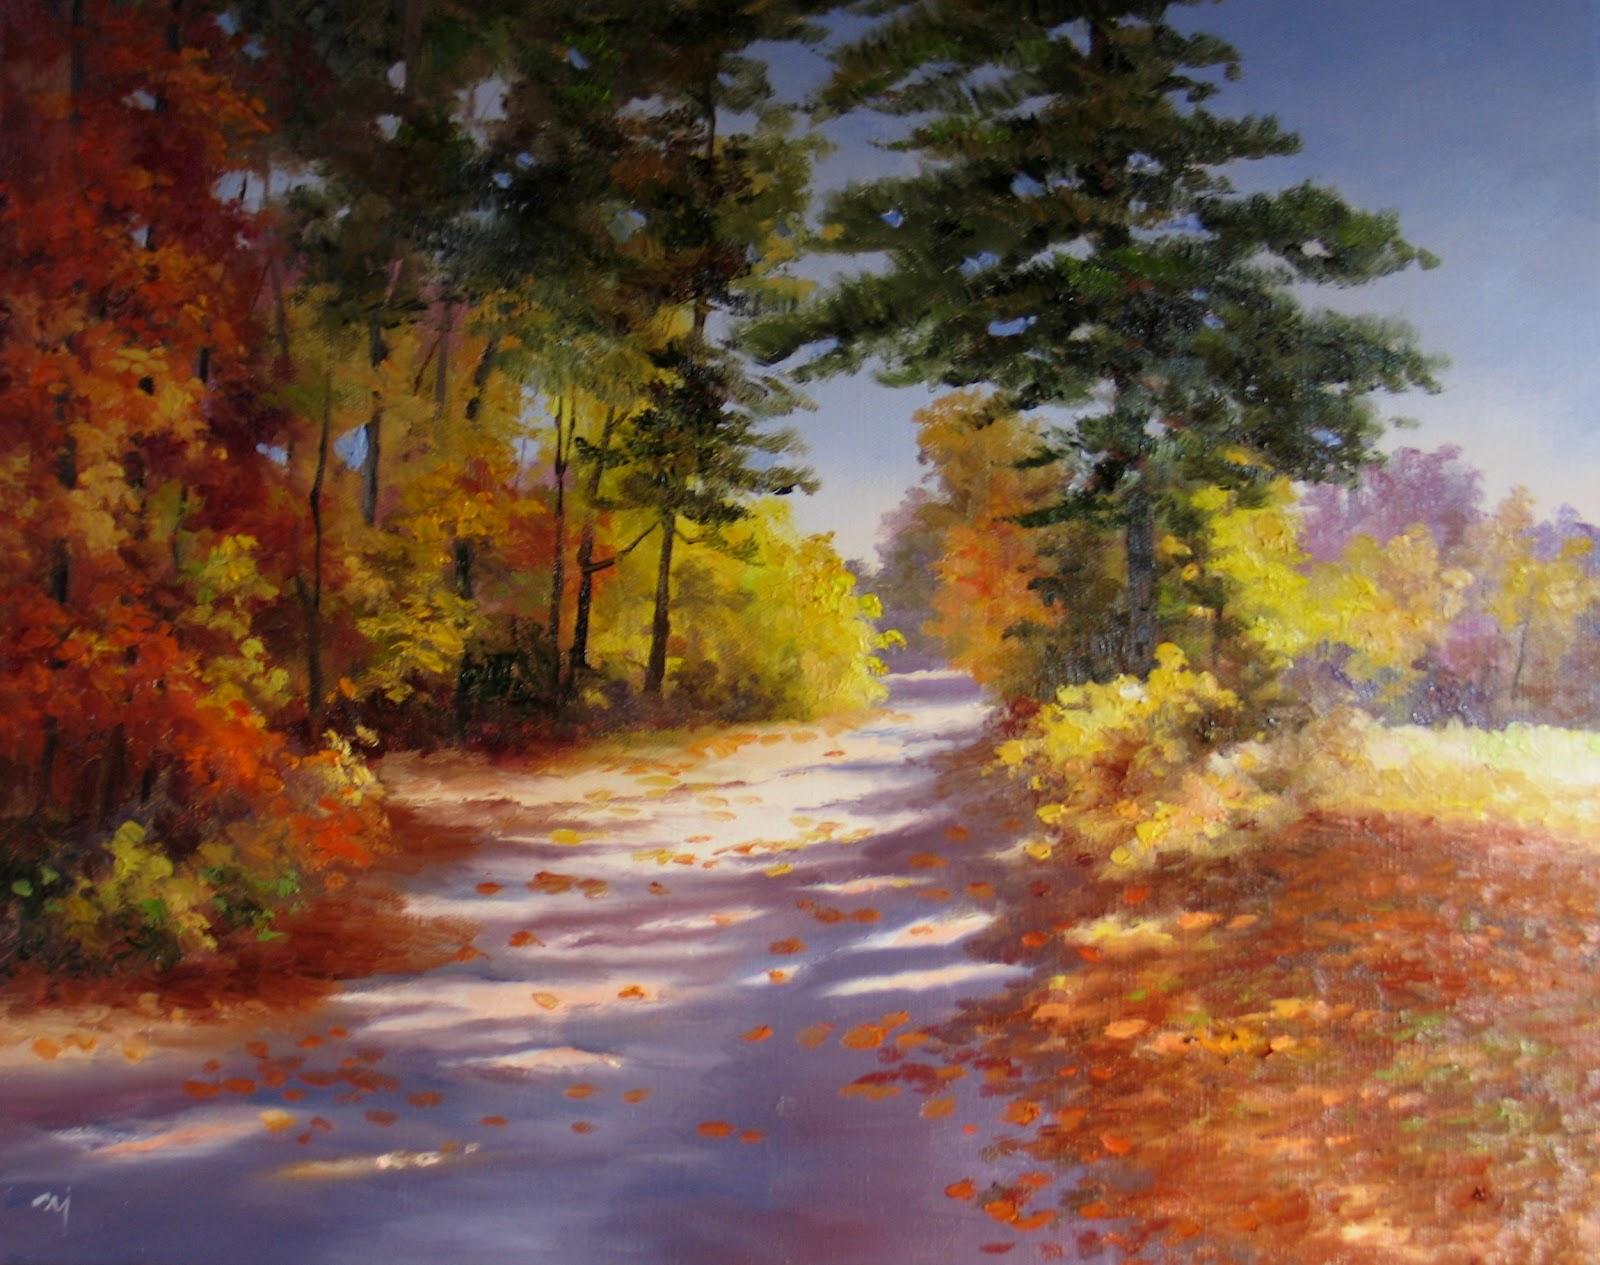 Nel's Everyday Painting: 9/23/12 - 9/30/12